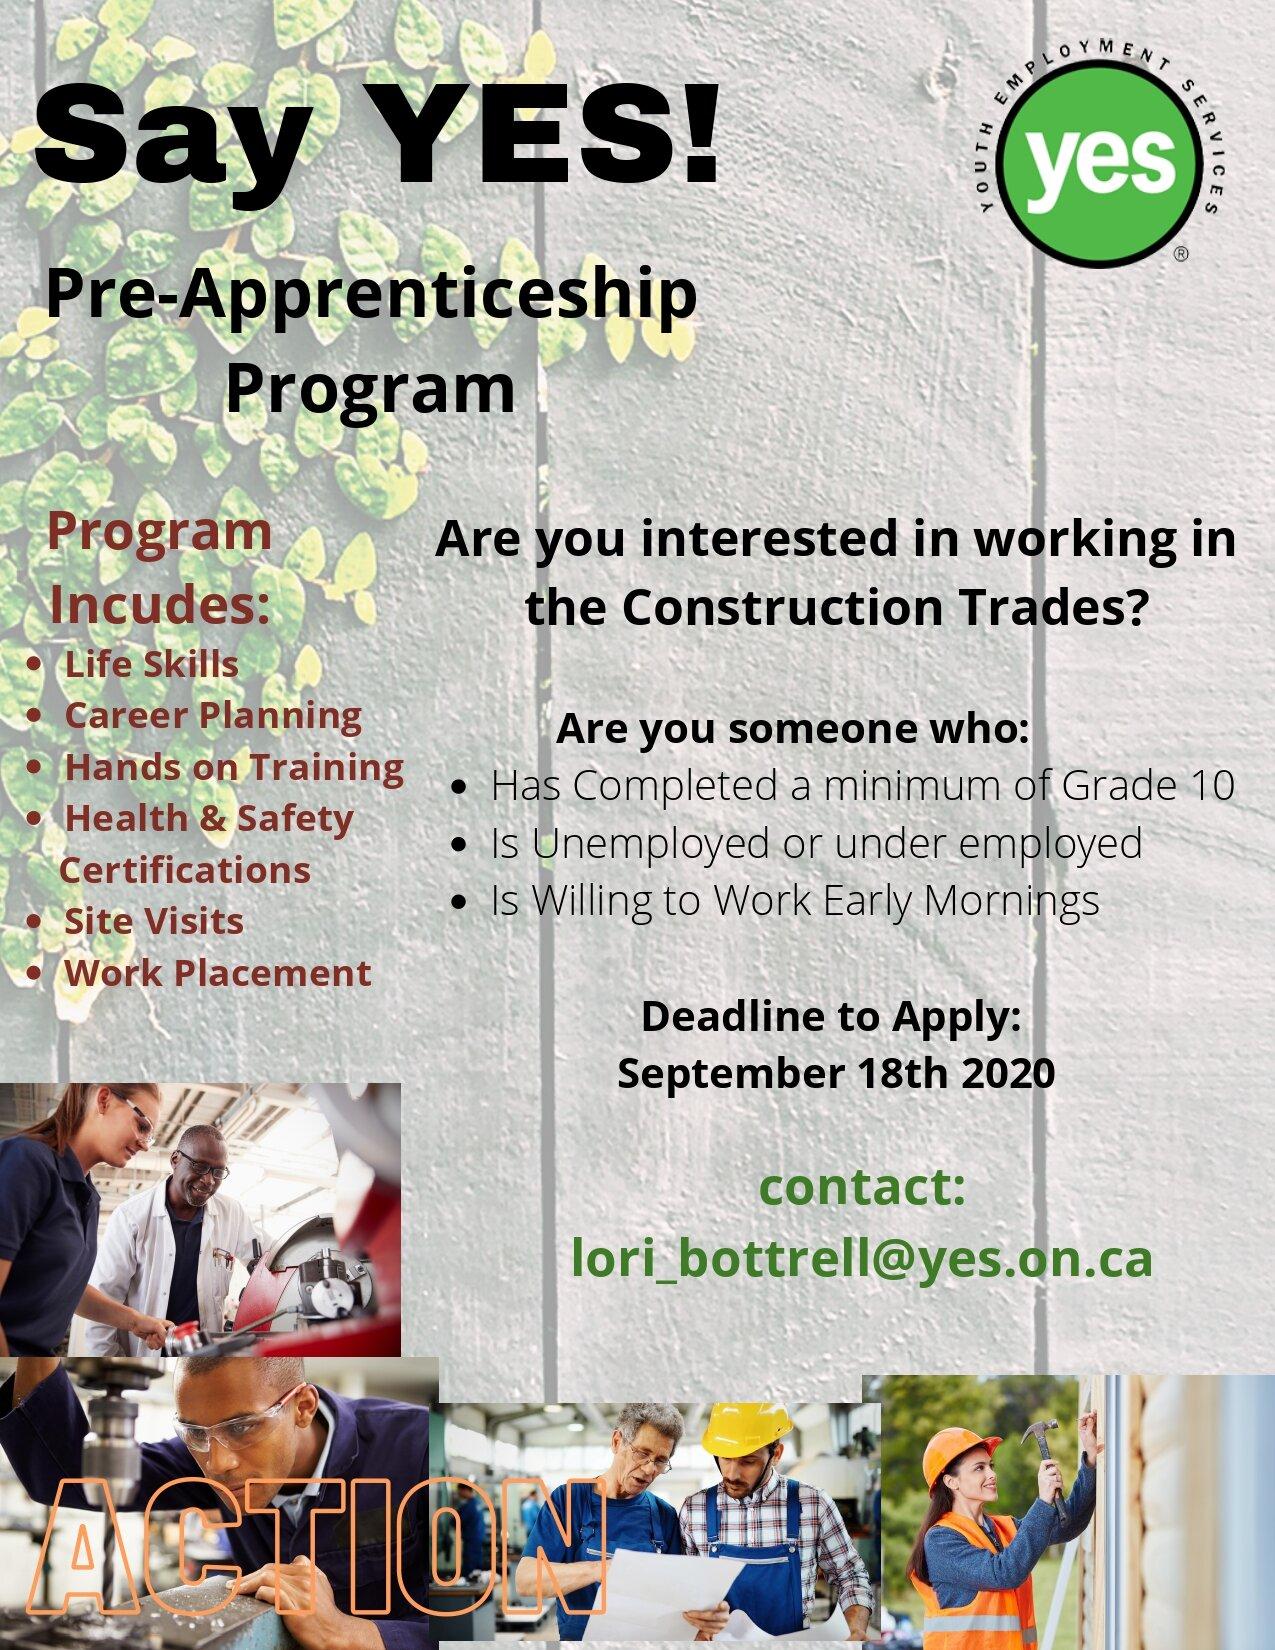 Pre-Apprenticeship Construction Trades